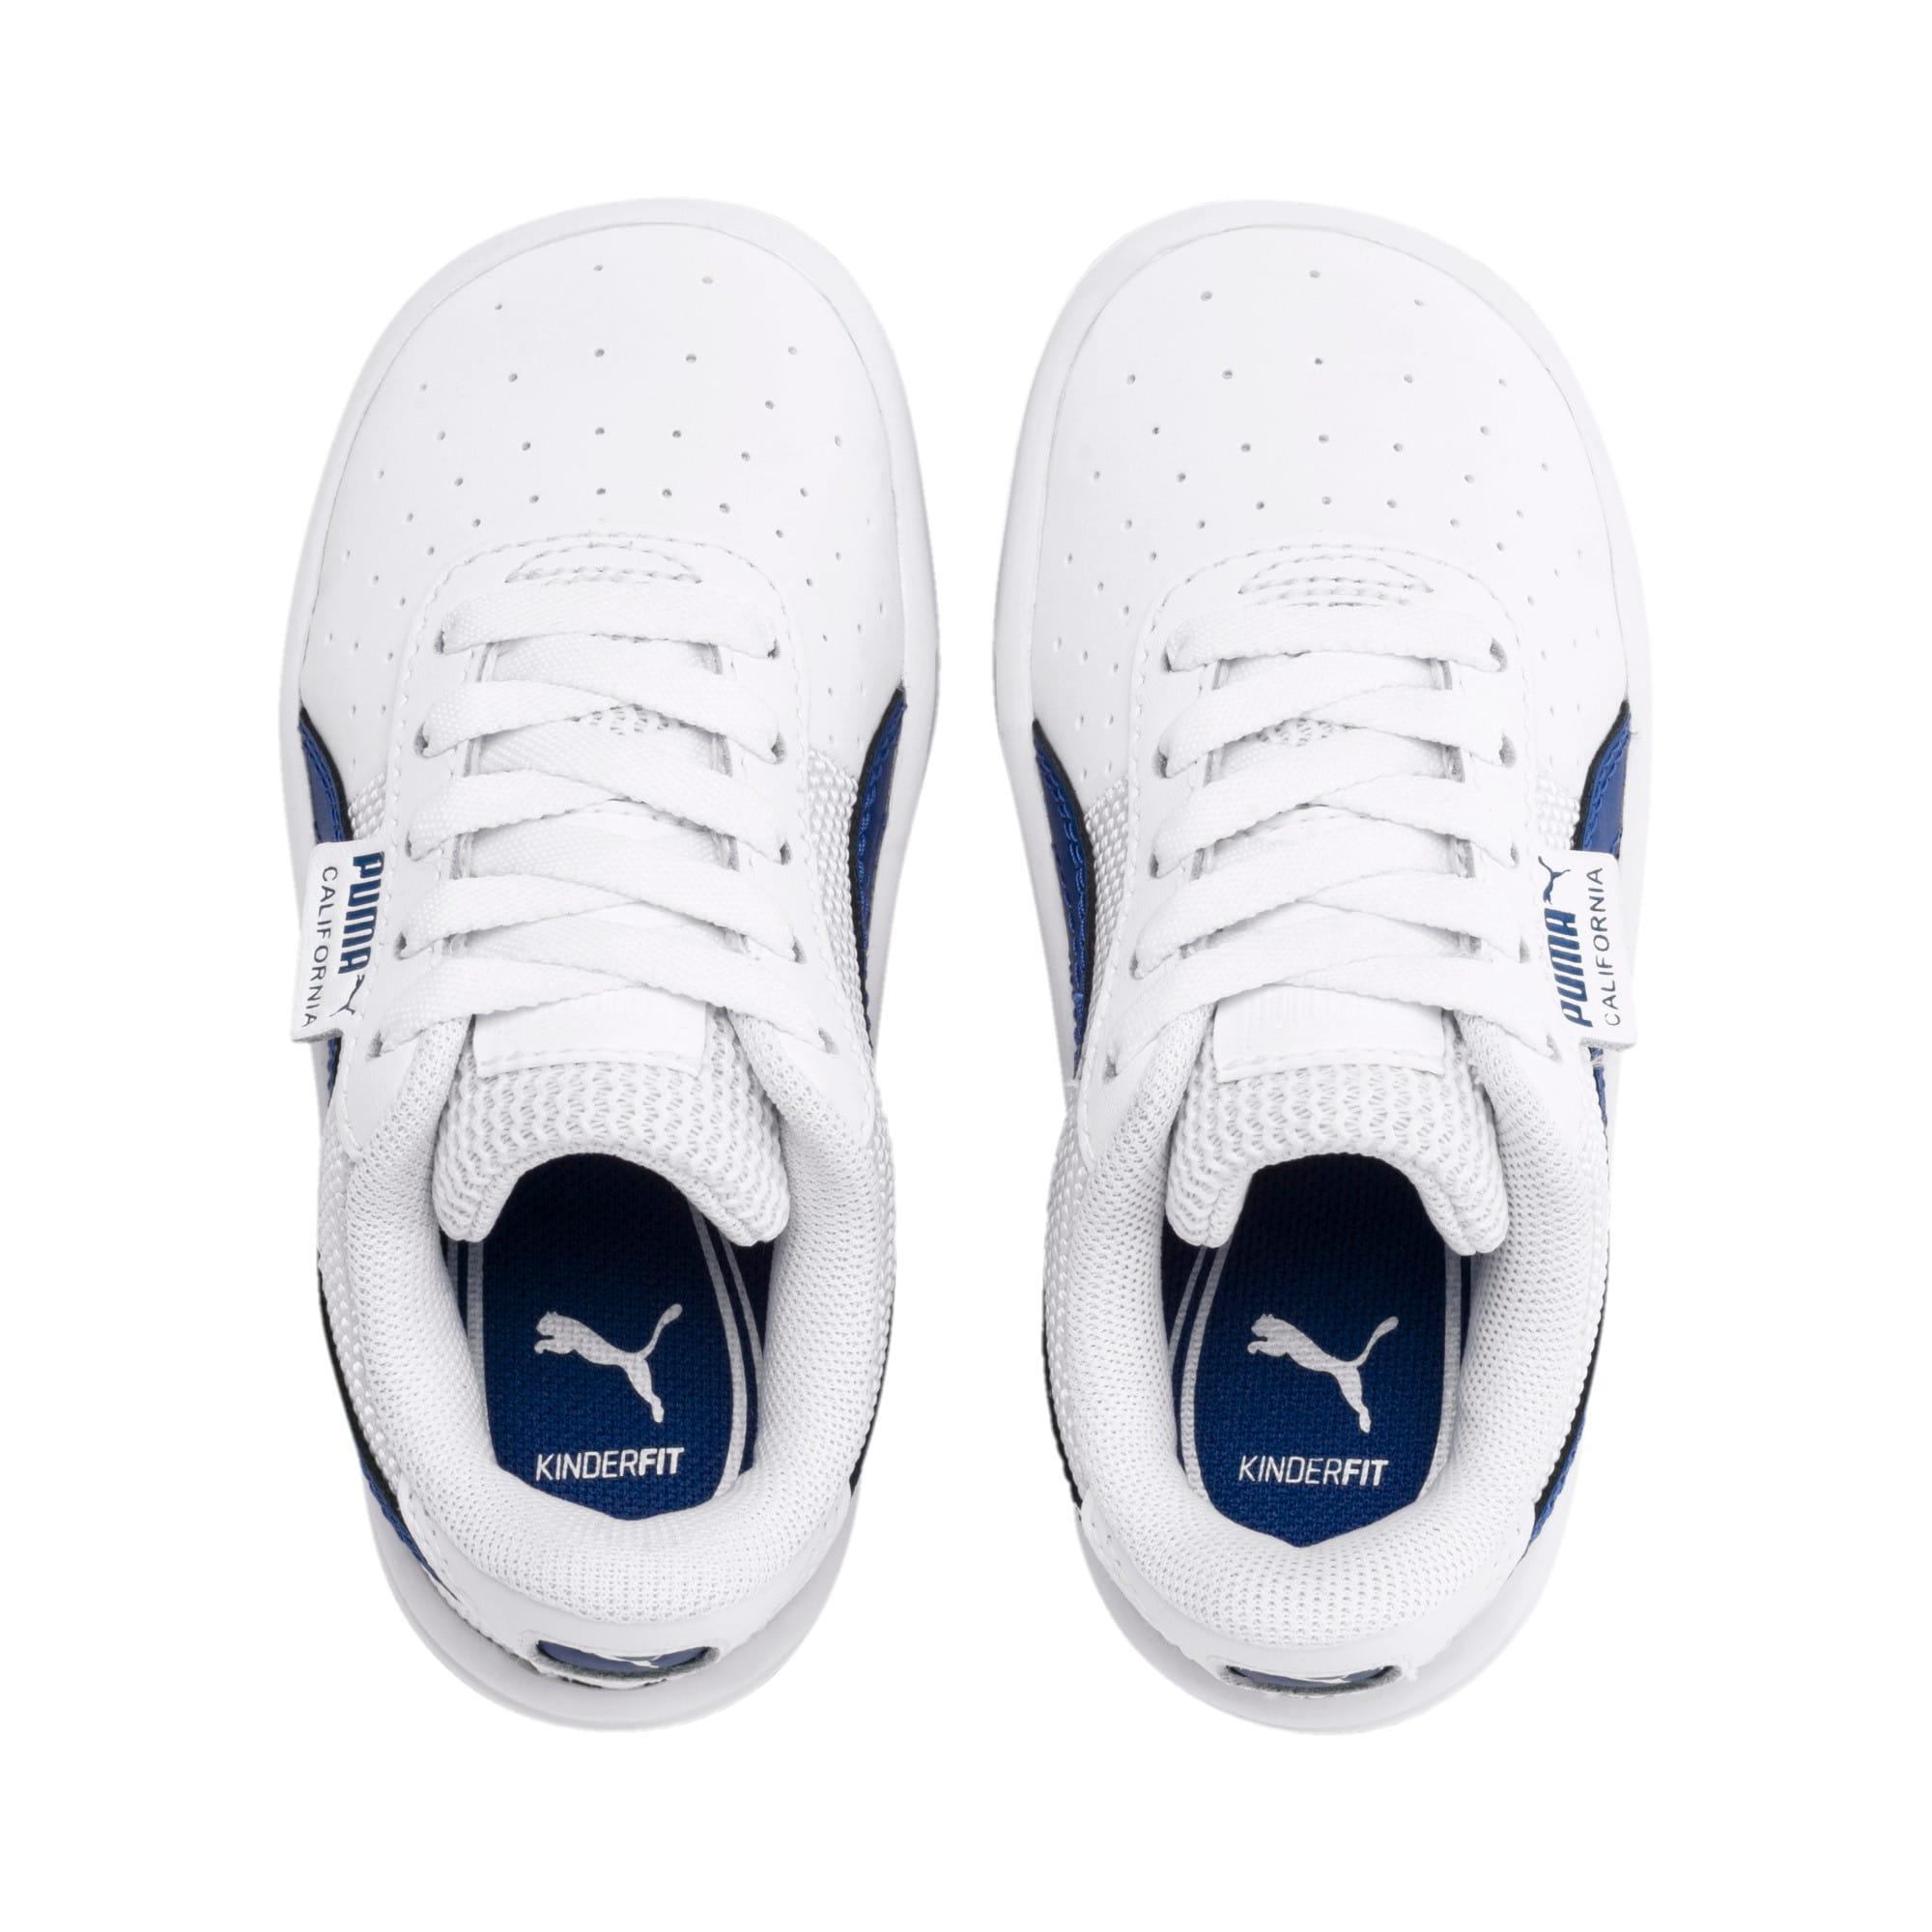 Thumbnail 6 of California Toddler Shoes, Puma White-Galaxy Blue, medium